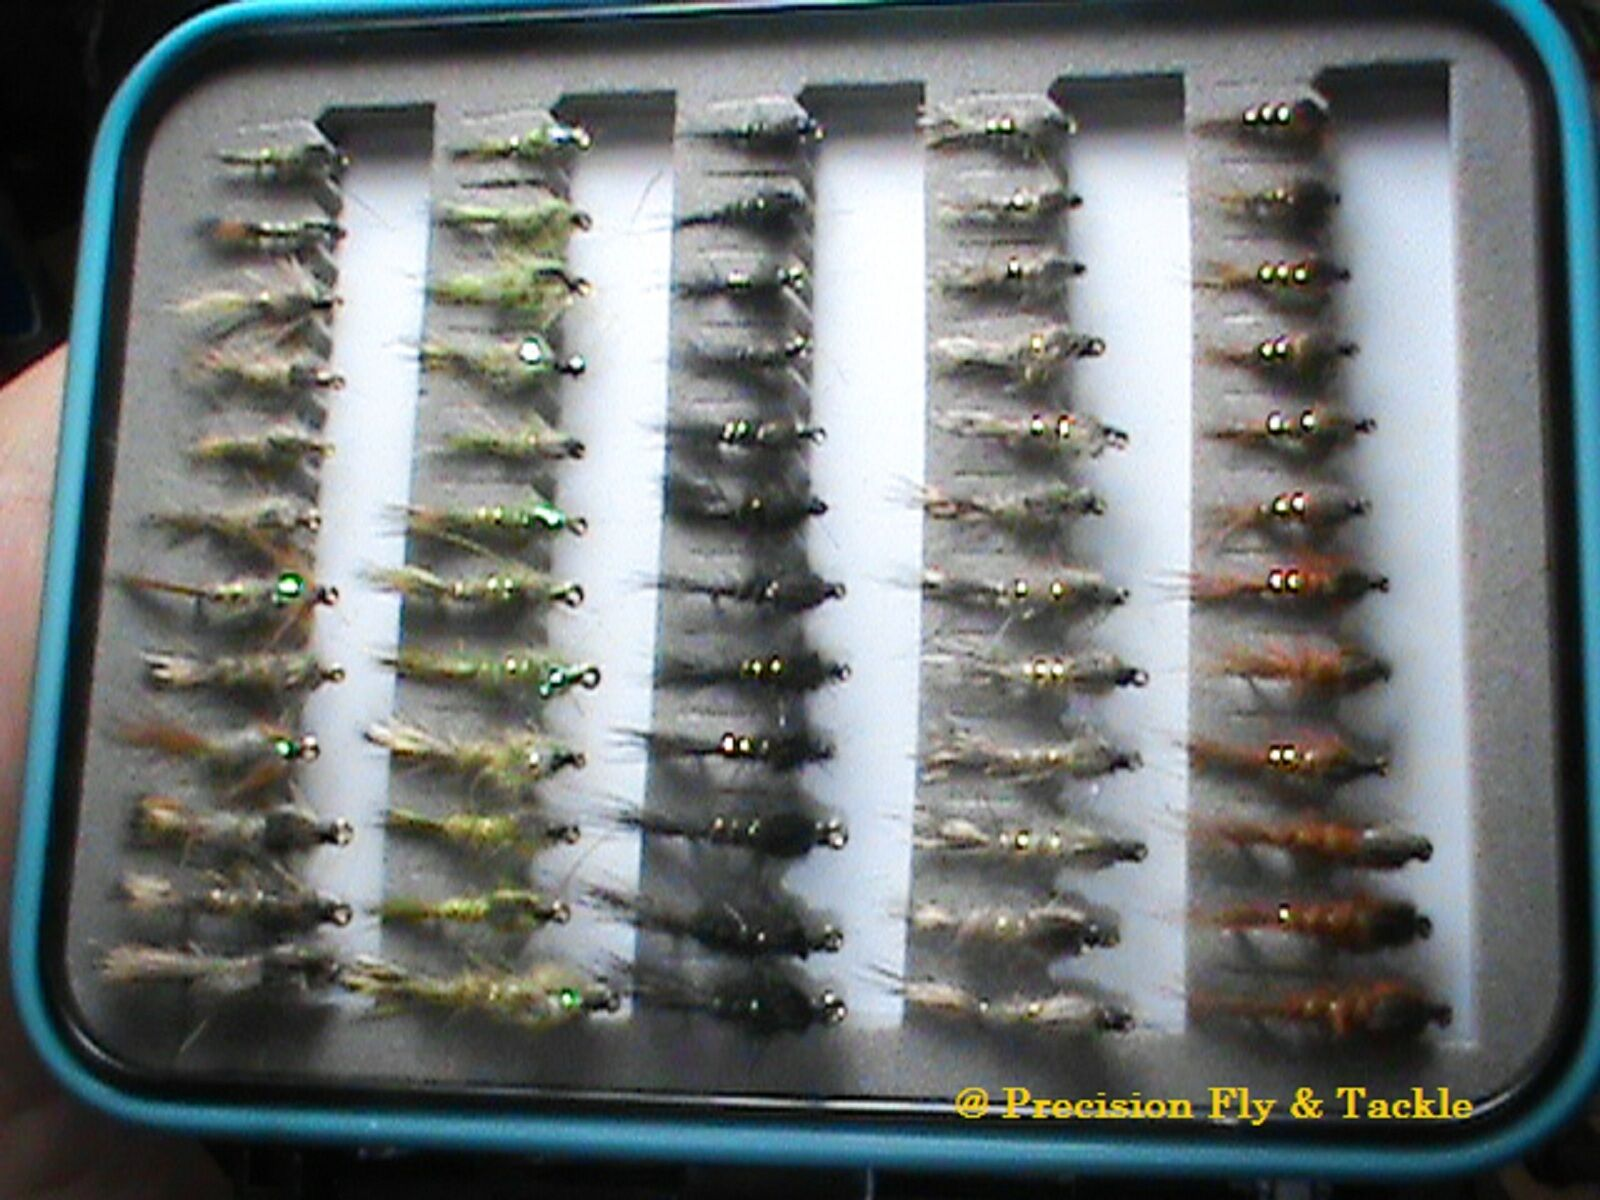 72 Hare's Ears In Fly Box  Trout Wet Flies  Fly Fishing Flies US Veteran Owned